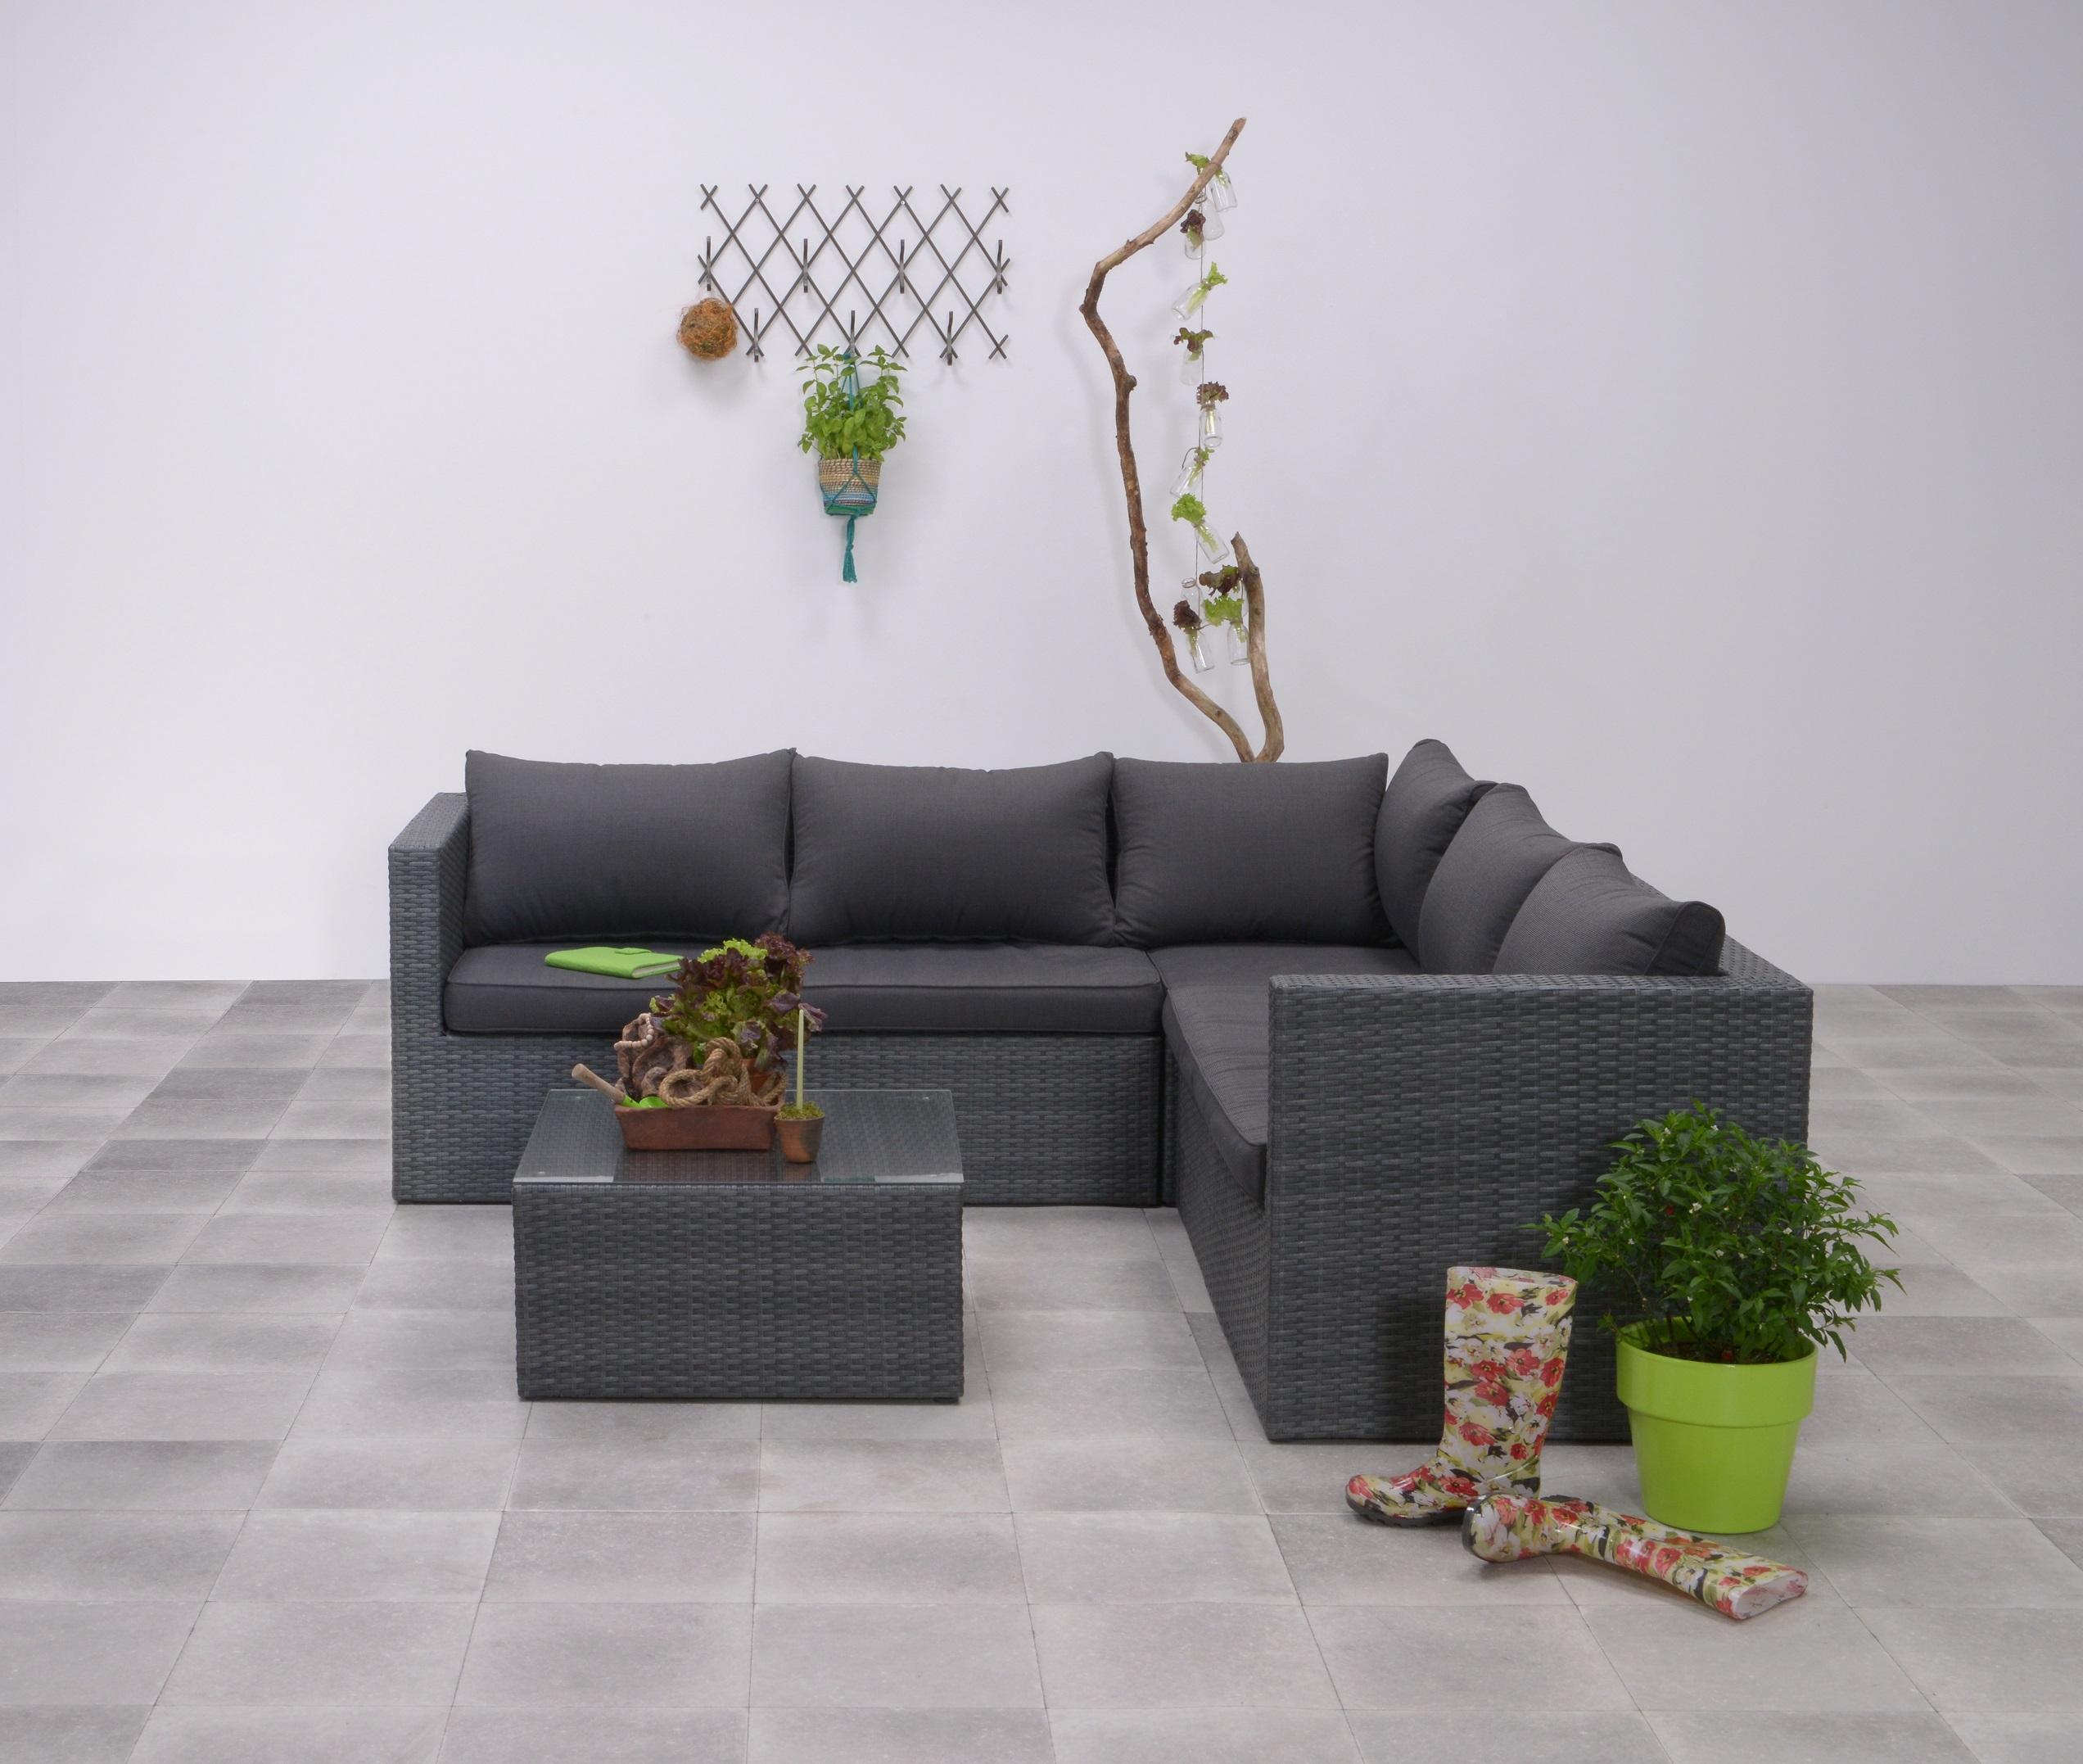 ulm polyrattan ecklounge gartenm bel sitzgruppe grau lounge m bel garten. Black Bedroom Furniture Sets. Home Design Ideas